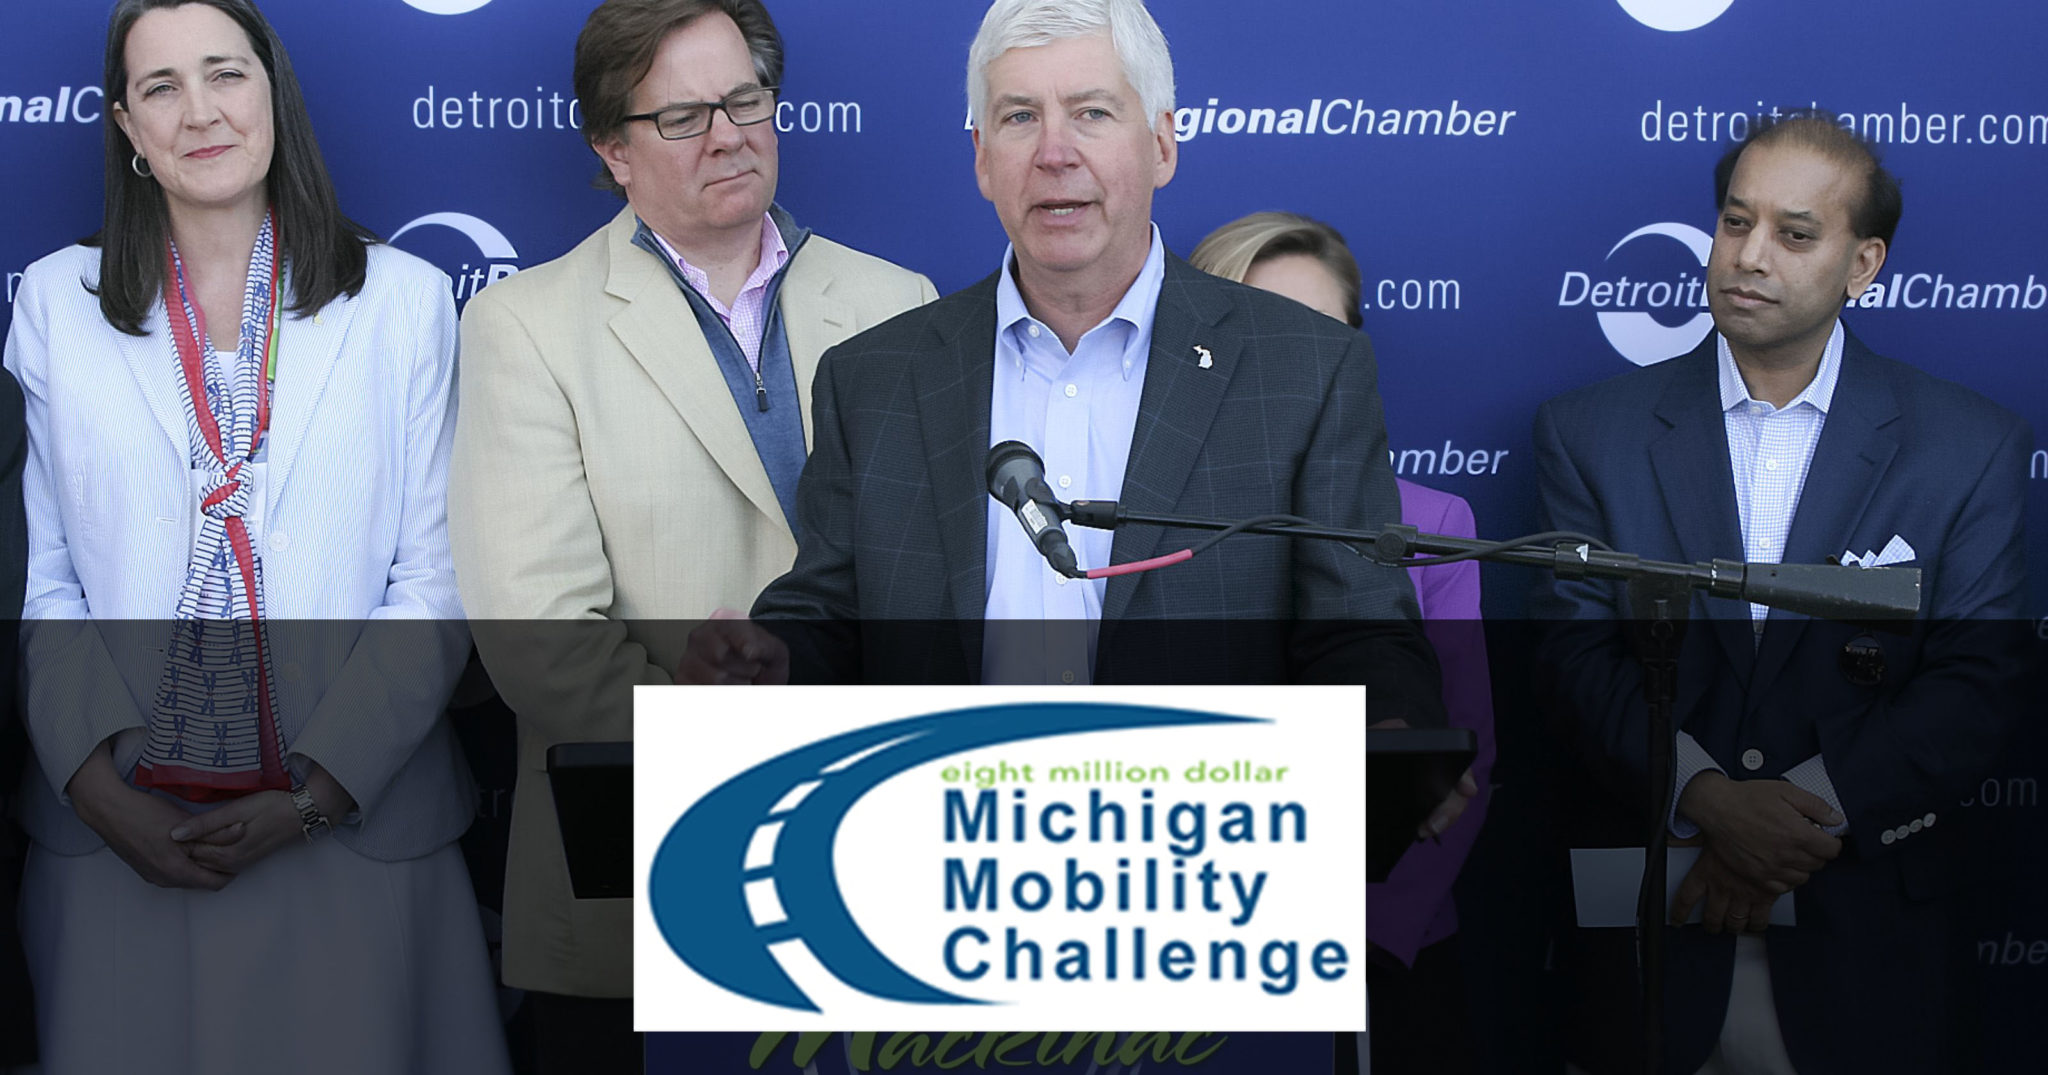 $8 Million Michigan Mobility Challenge - New Economy